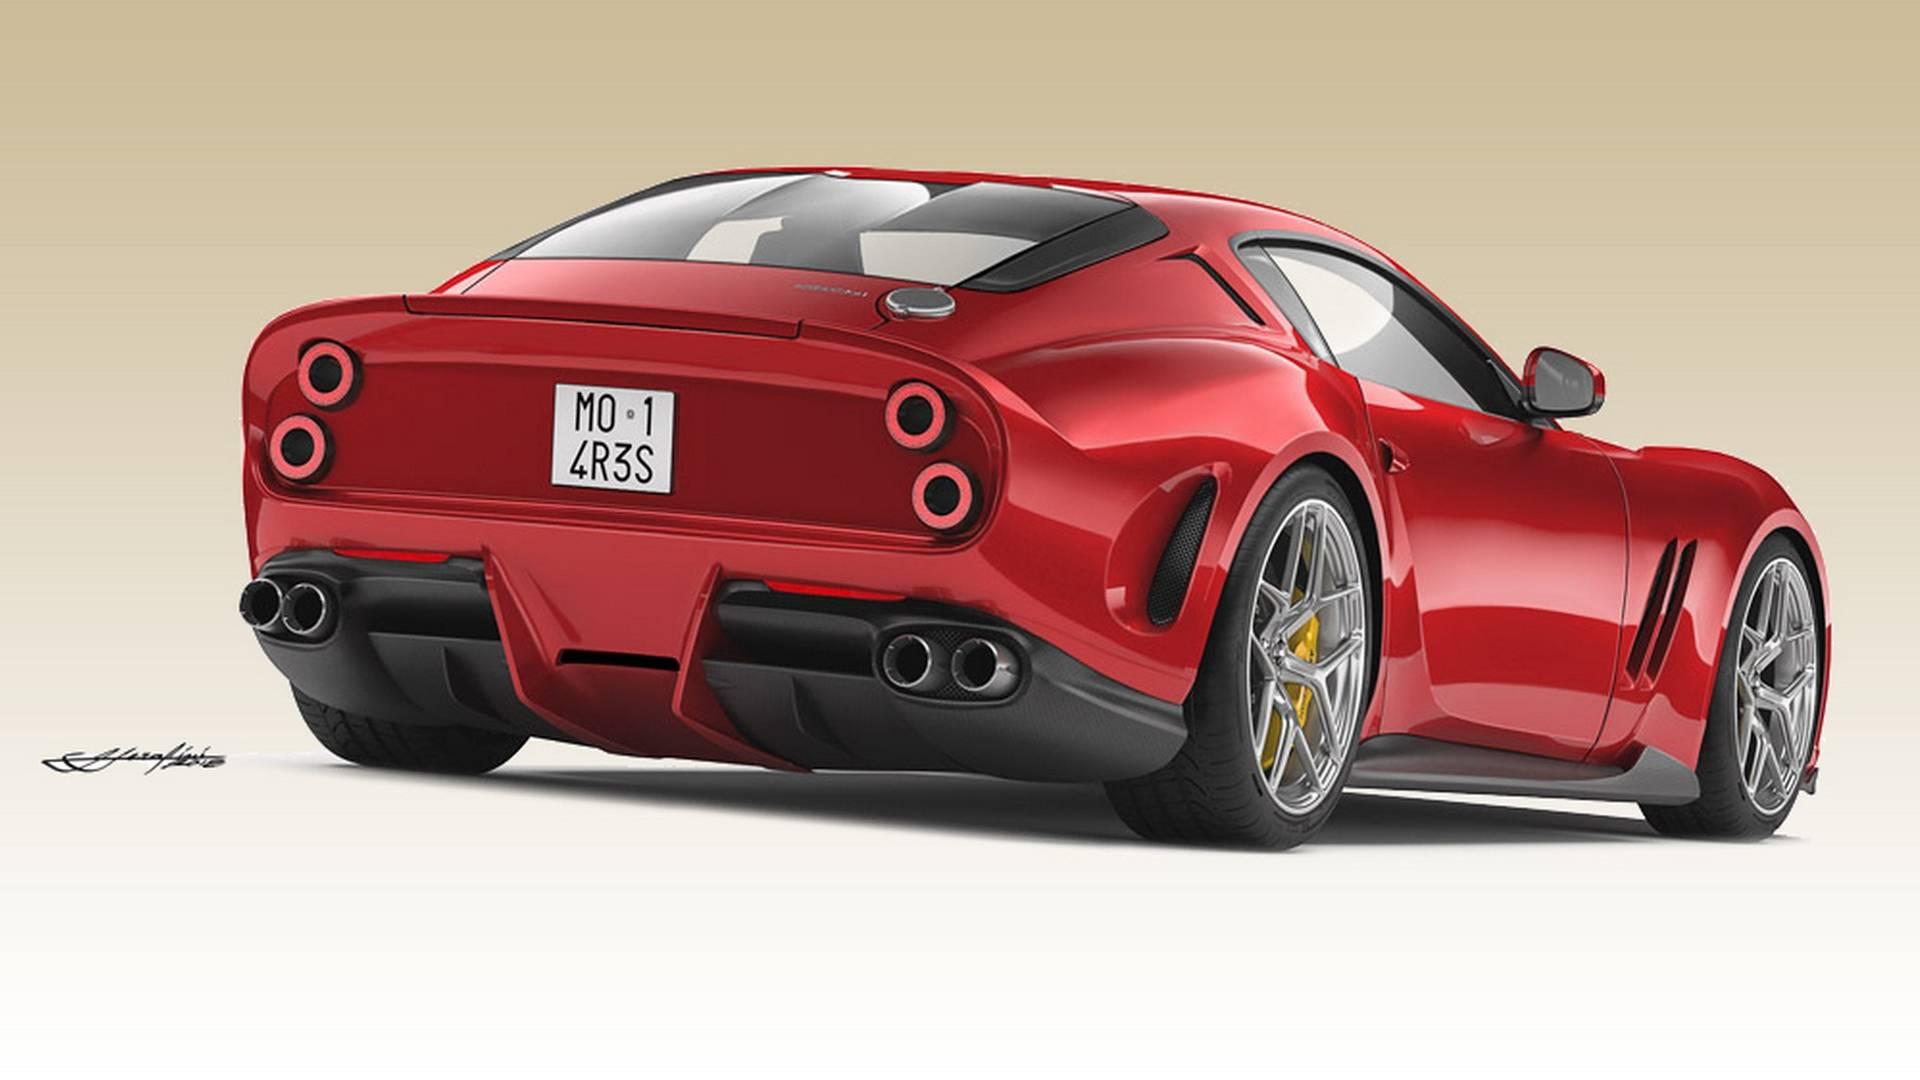 Coachbuilt Ferrari 250 Gto Revealed Based On 812